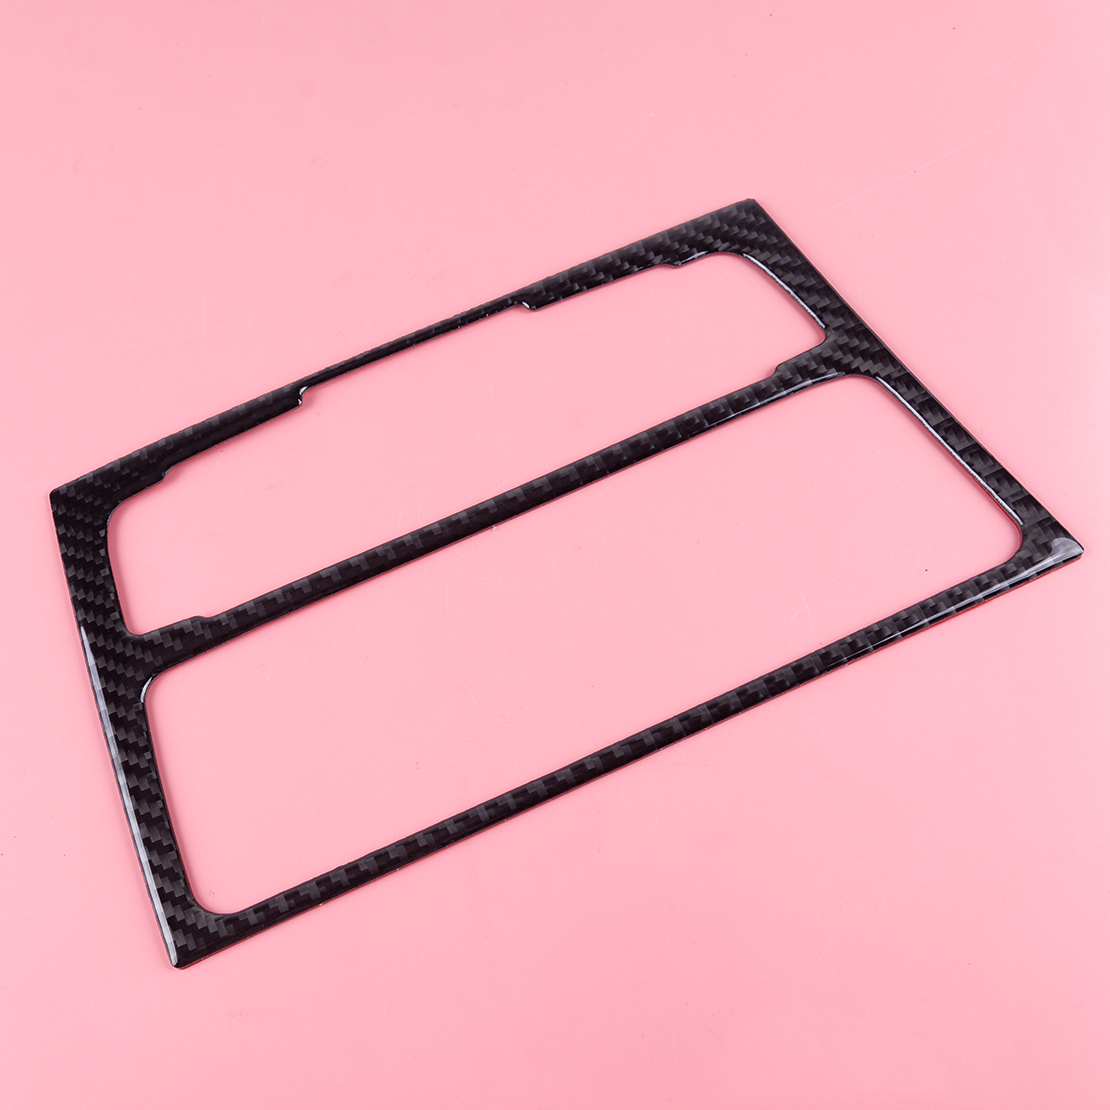 Fit For Audi A4 B8 A5 Carbon Fiber Center Console AC//CD Panel Cover Trim Frame